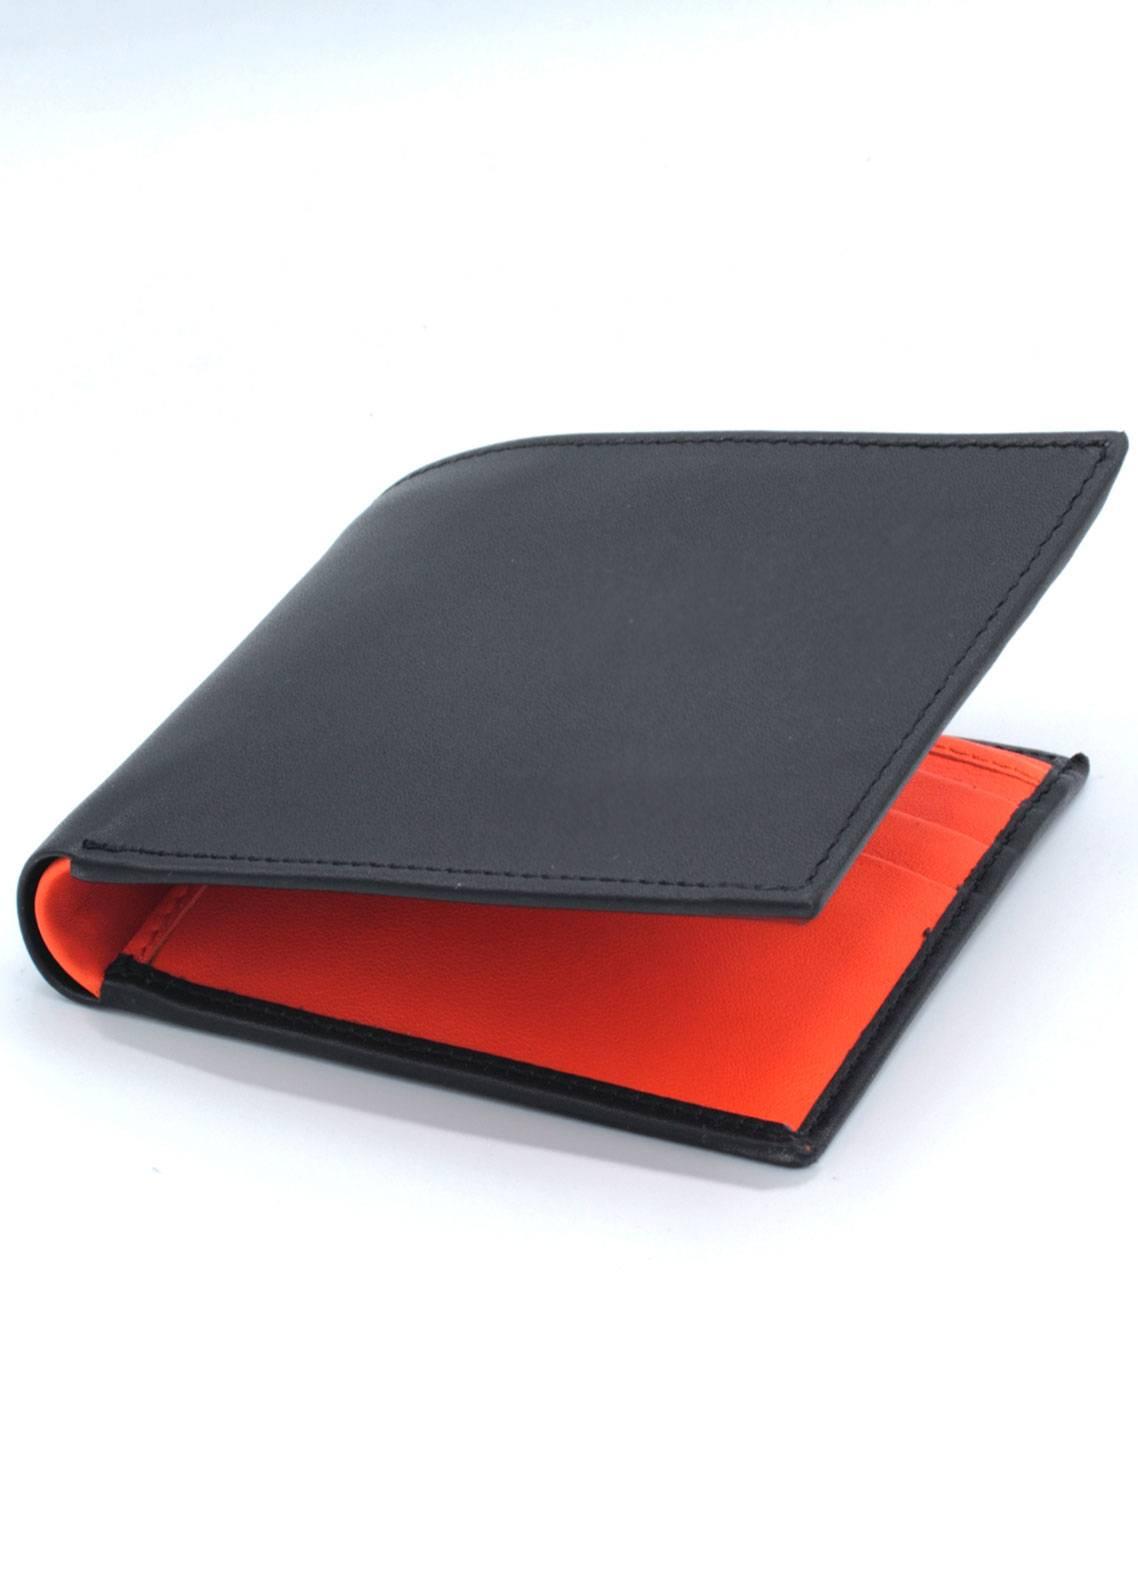 Skangen Plain Exterior Premium Cow Leather Wallets SKWT-1008 - Men's Accessories